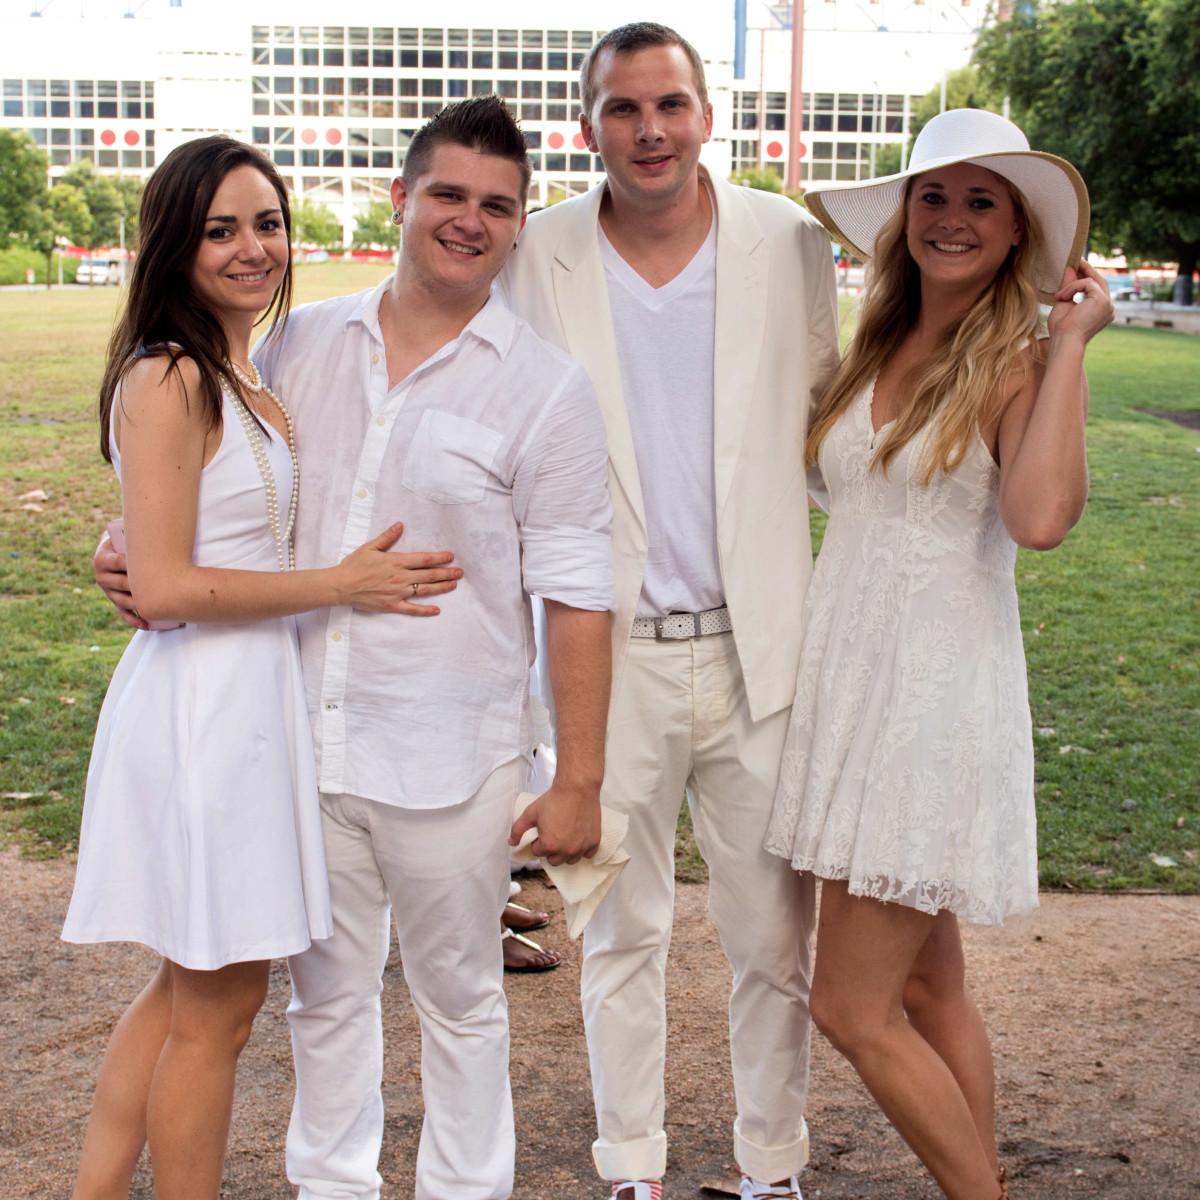 Houston, Diner en Blanc, June 2015, Mercedes Gomez, Noah Coffelt, Aaron Kane, Sarah Brissey